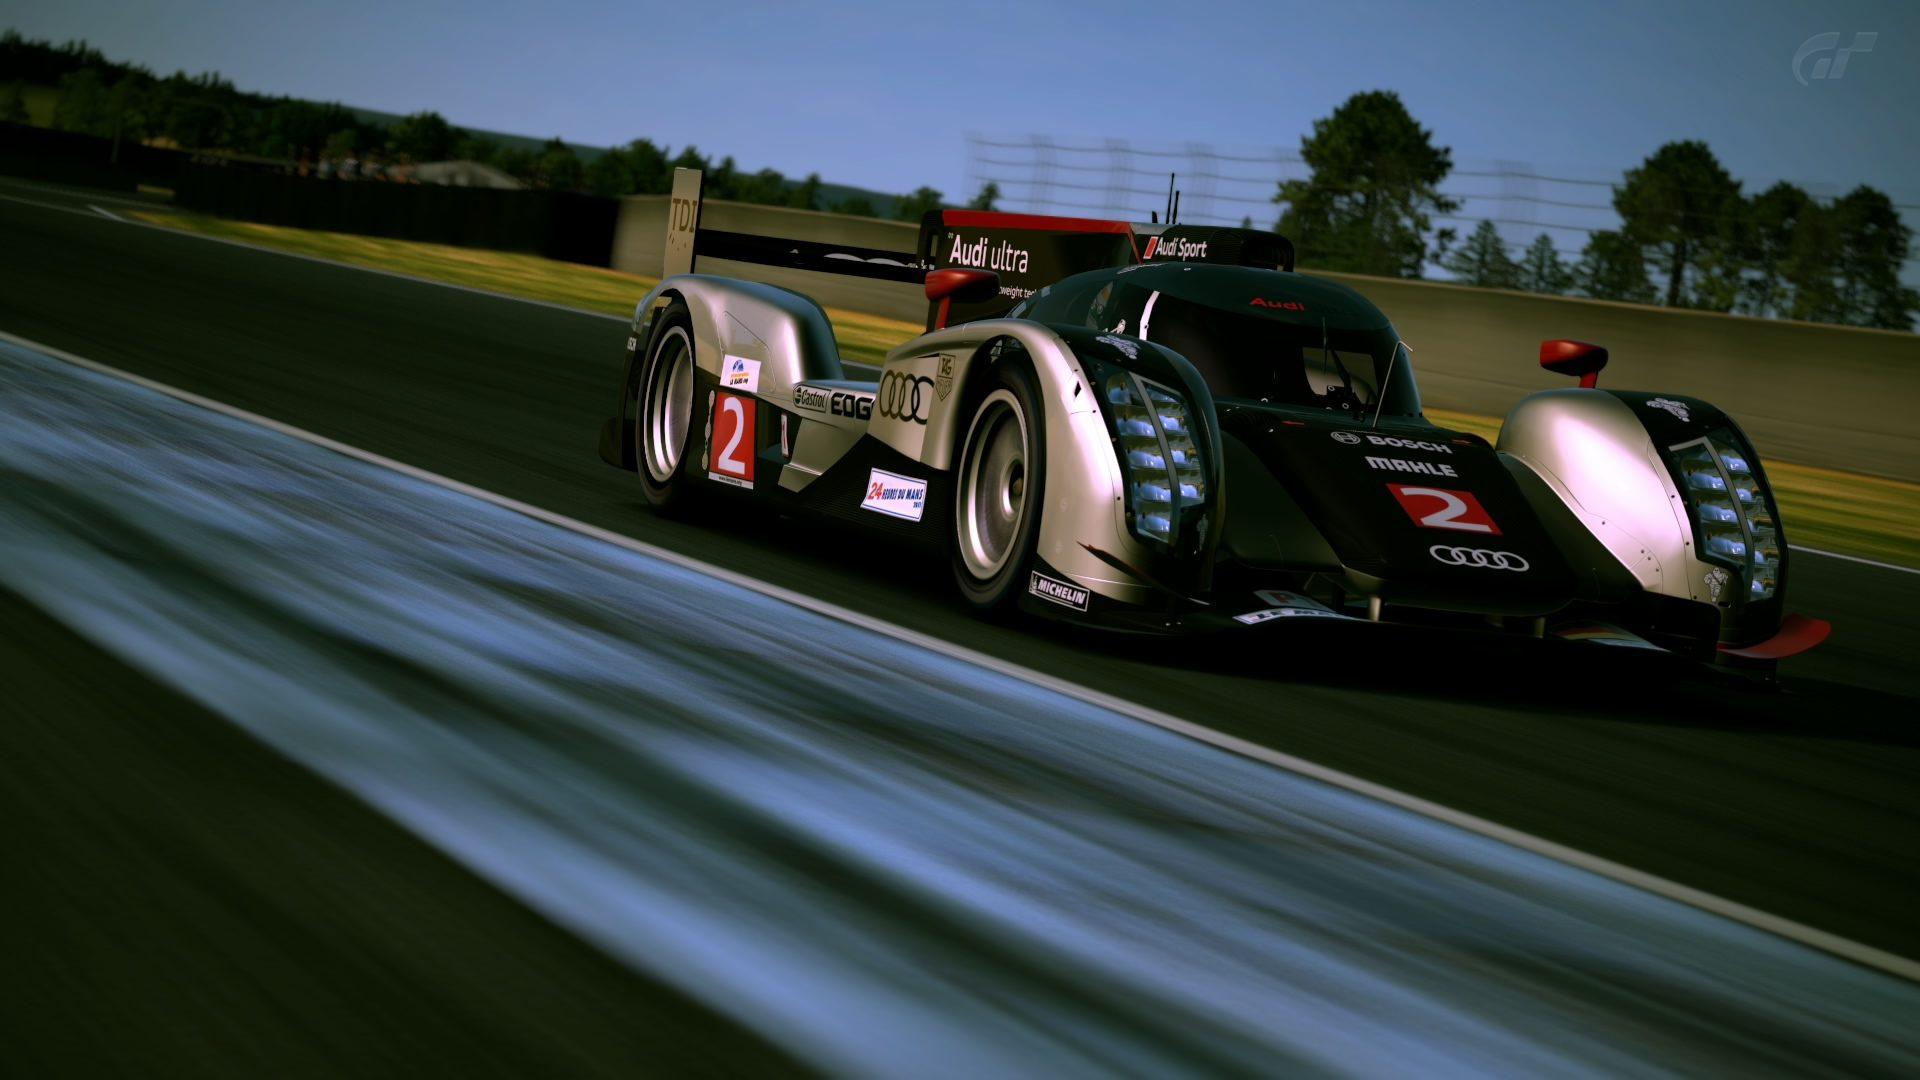 Circuit de la Sarthe 2009_46.jpg